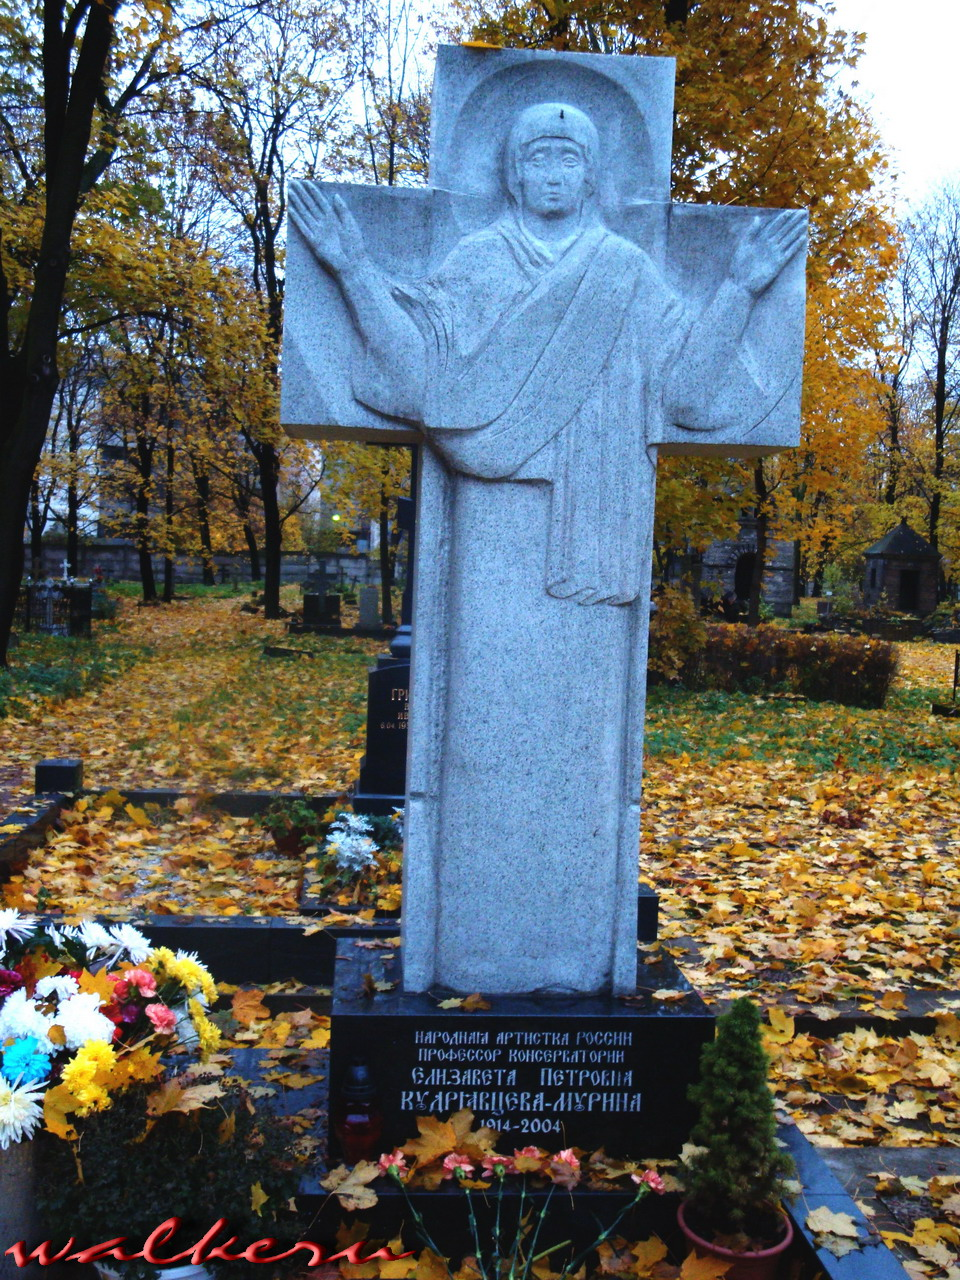 Е карцева берт ланкастер купить книгу в москве 2015-12-09